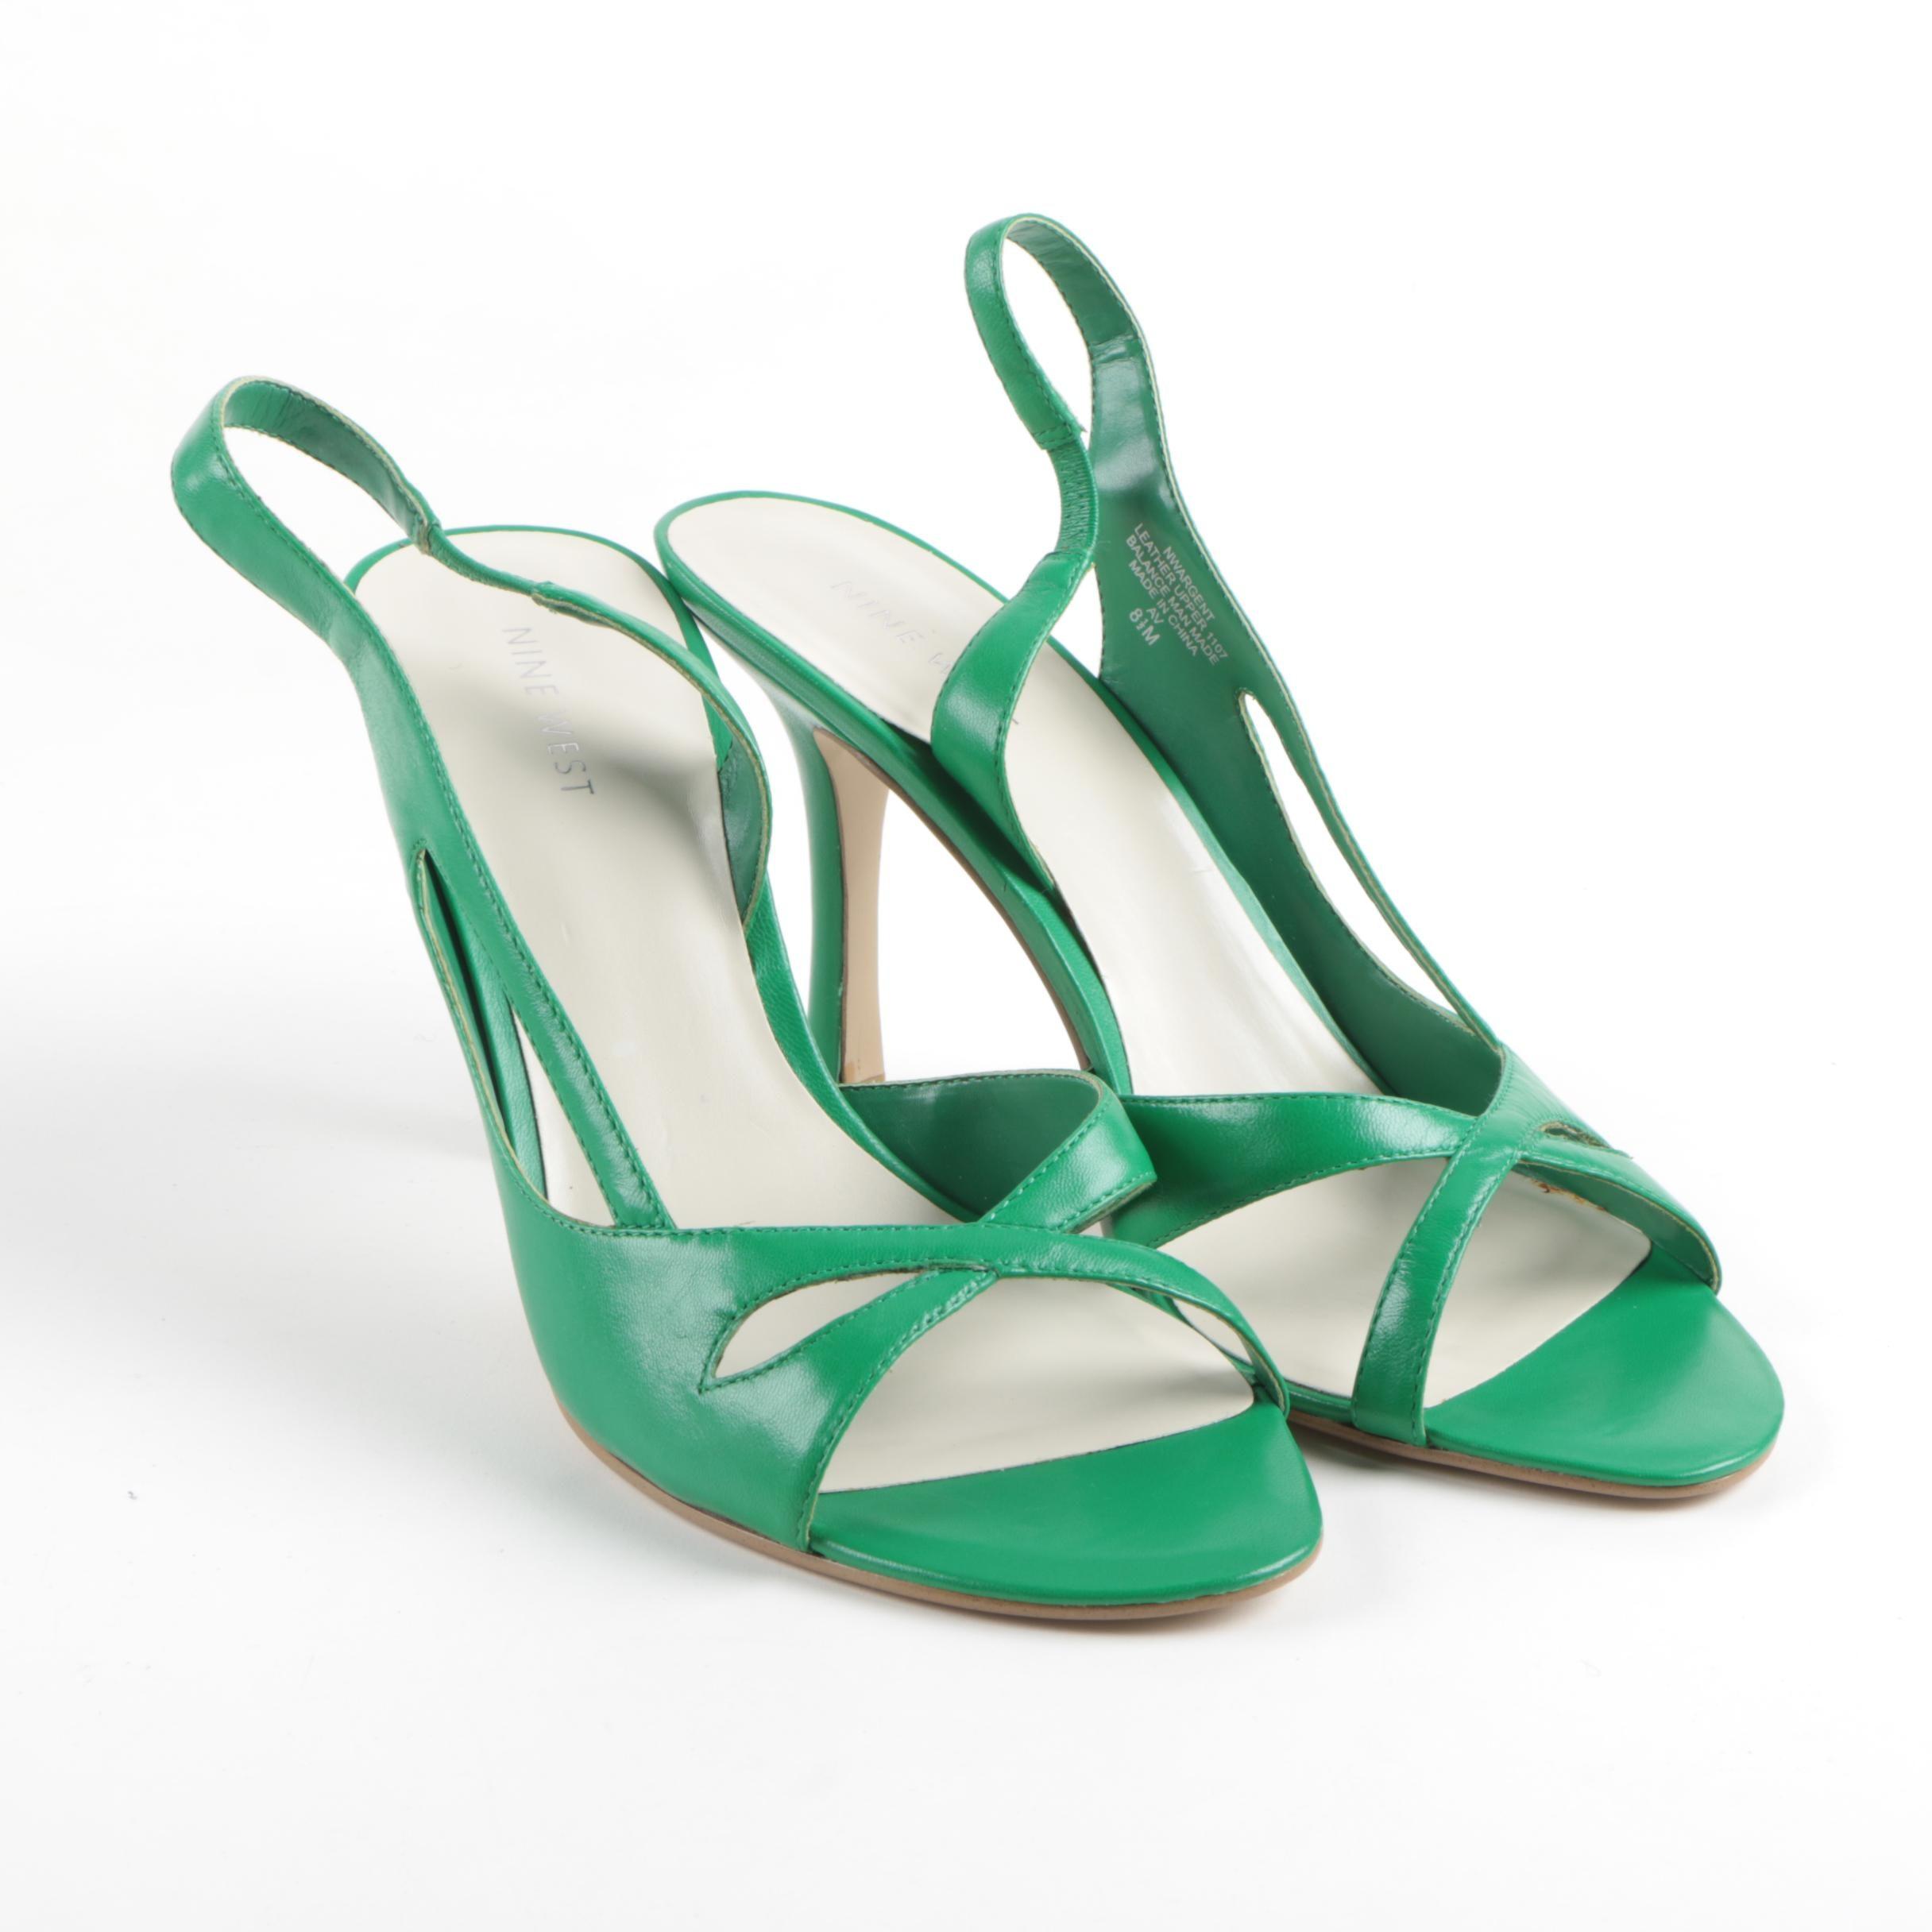 Nine West Green Leather Slingback Heeled Sandals